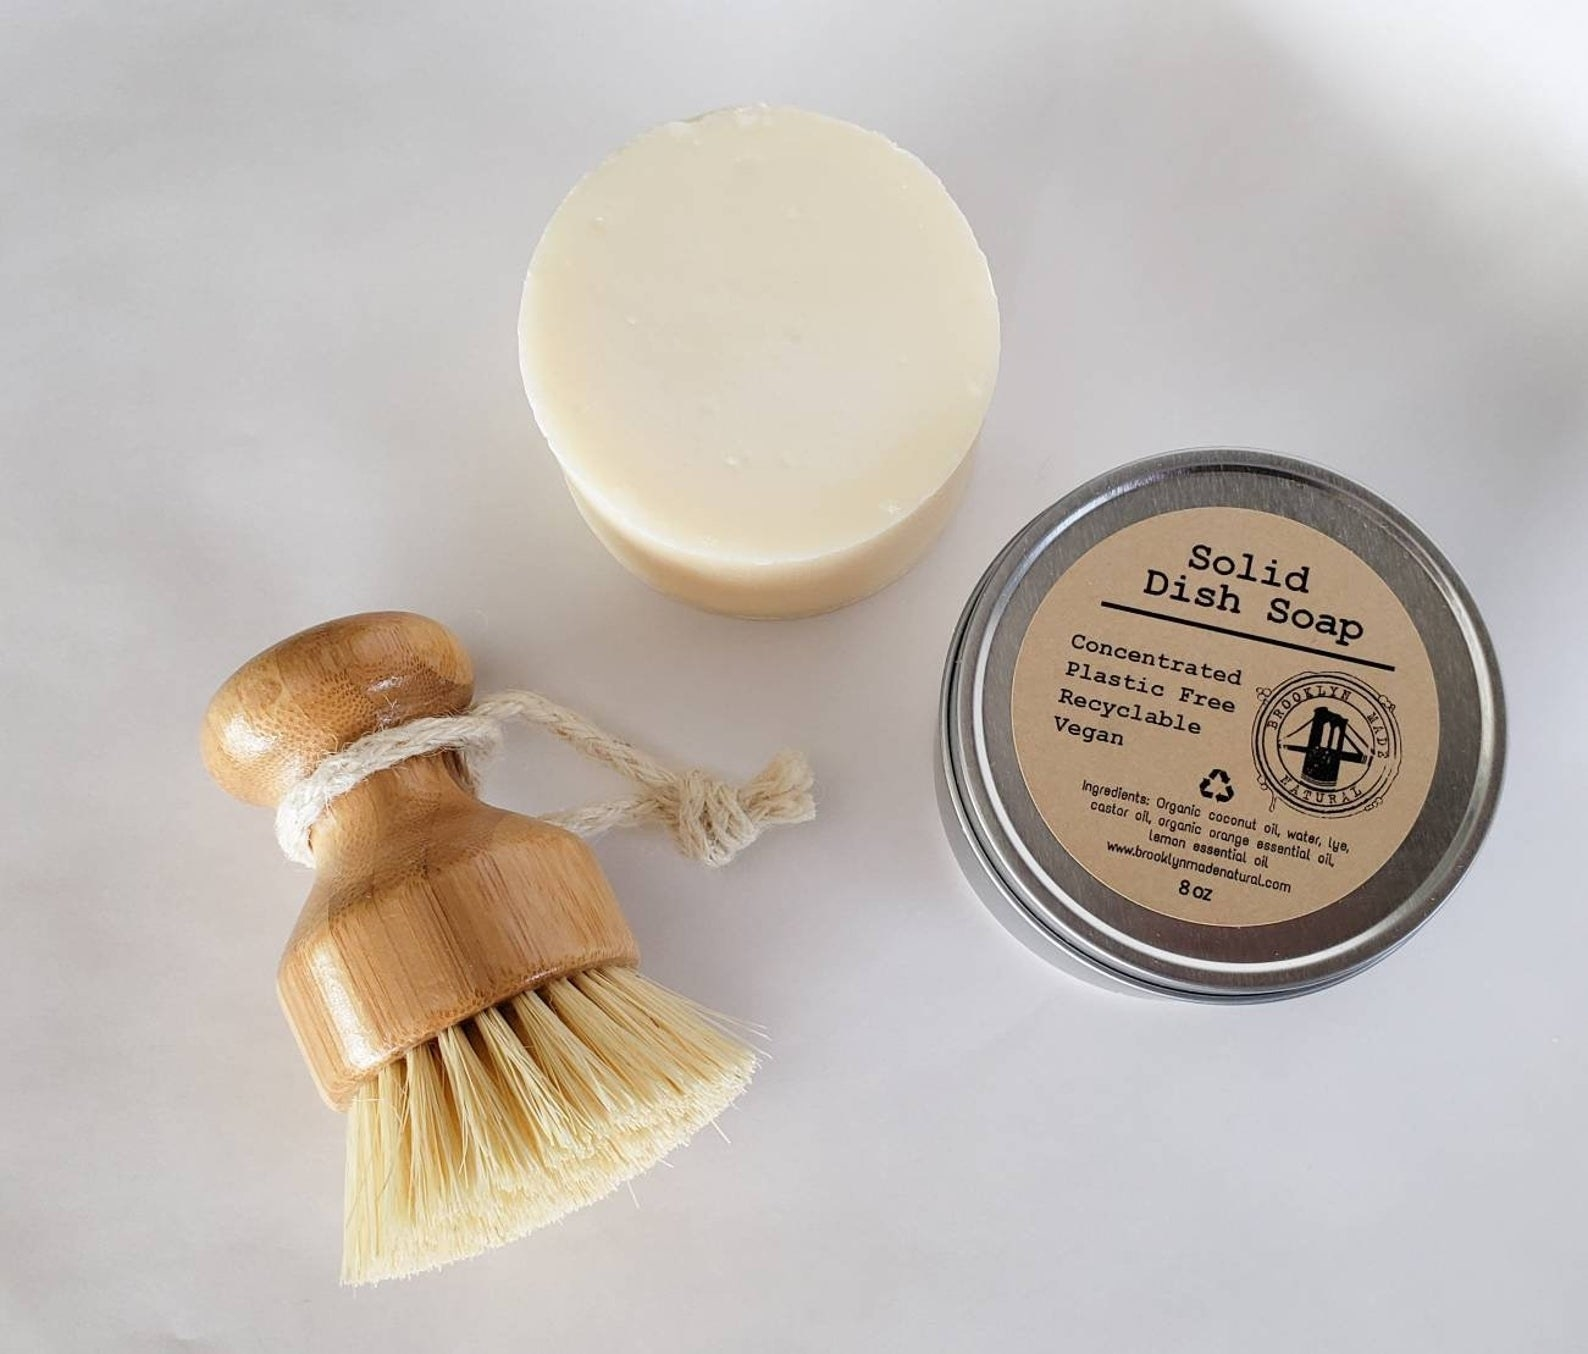 Solid dish soap in tin next to dish brush